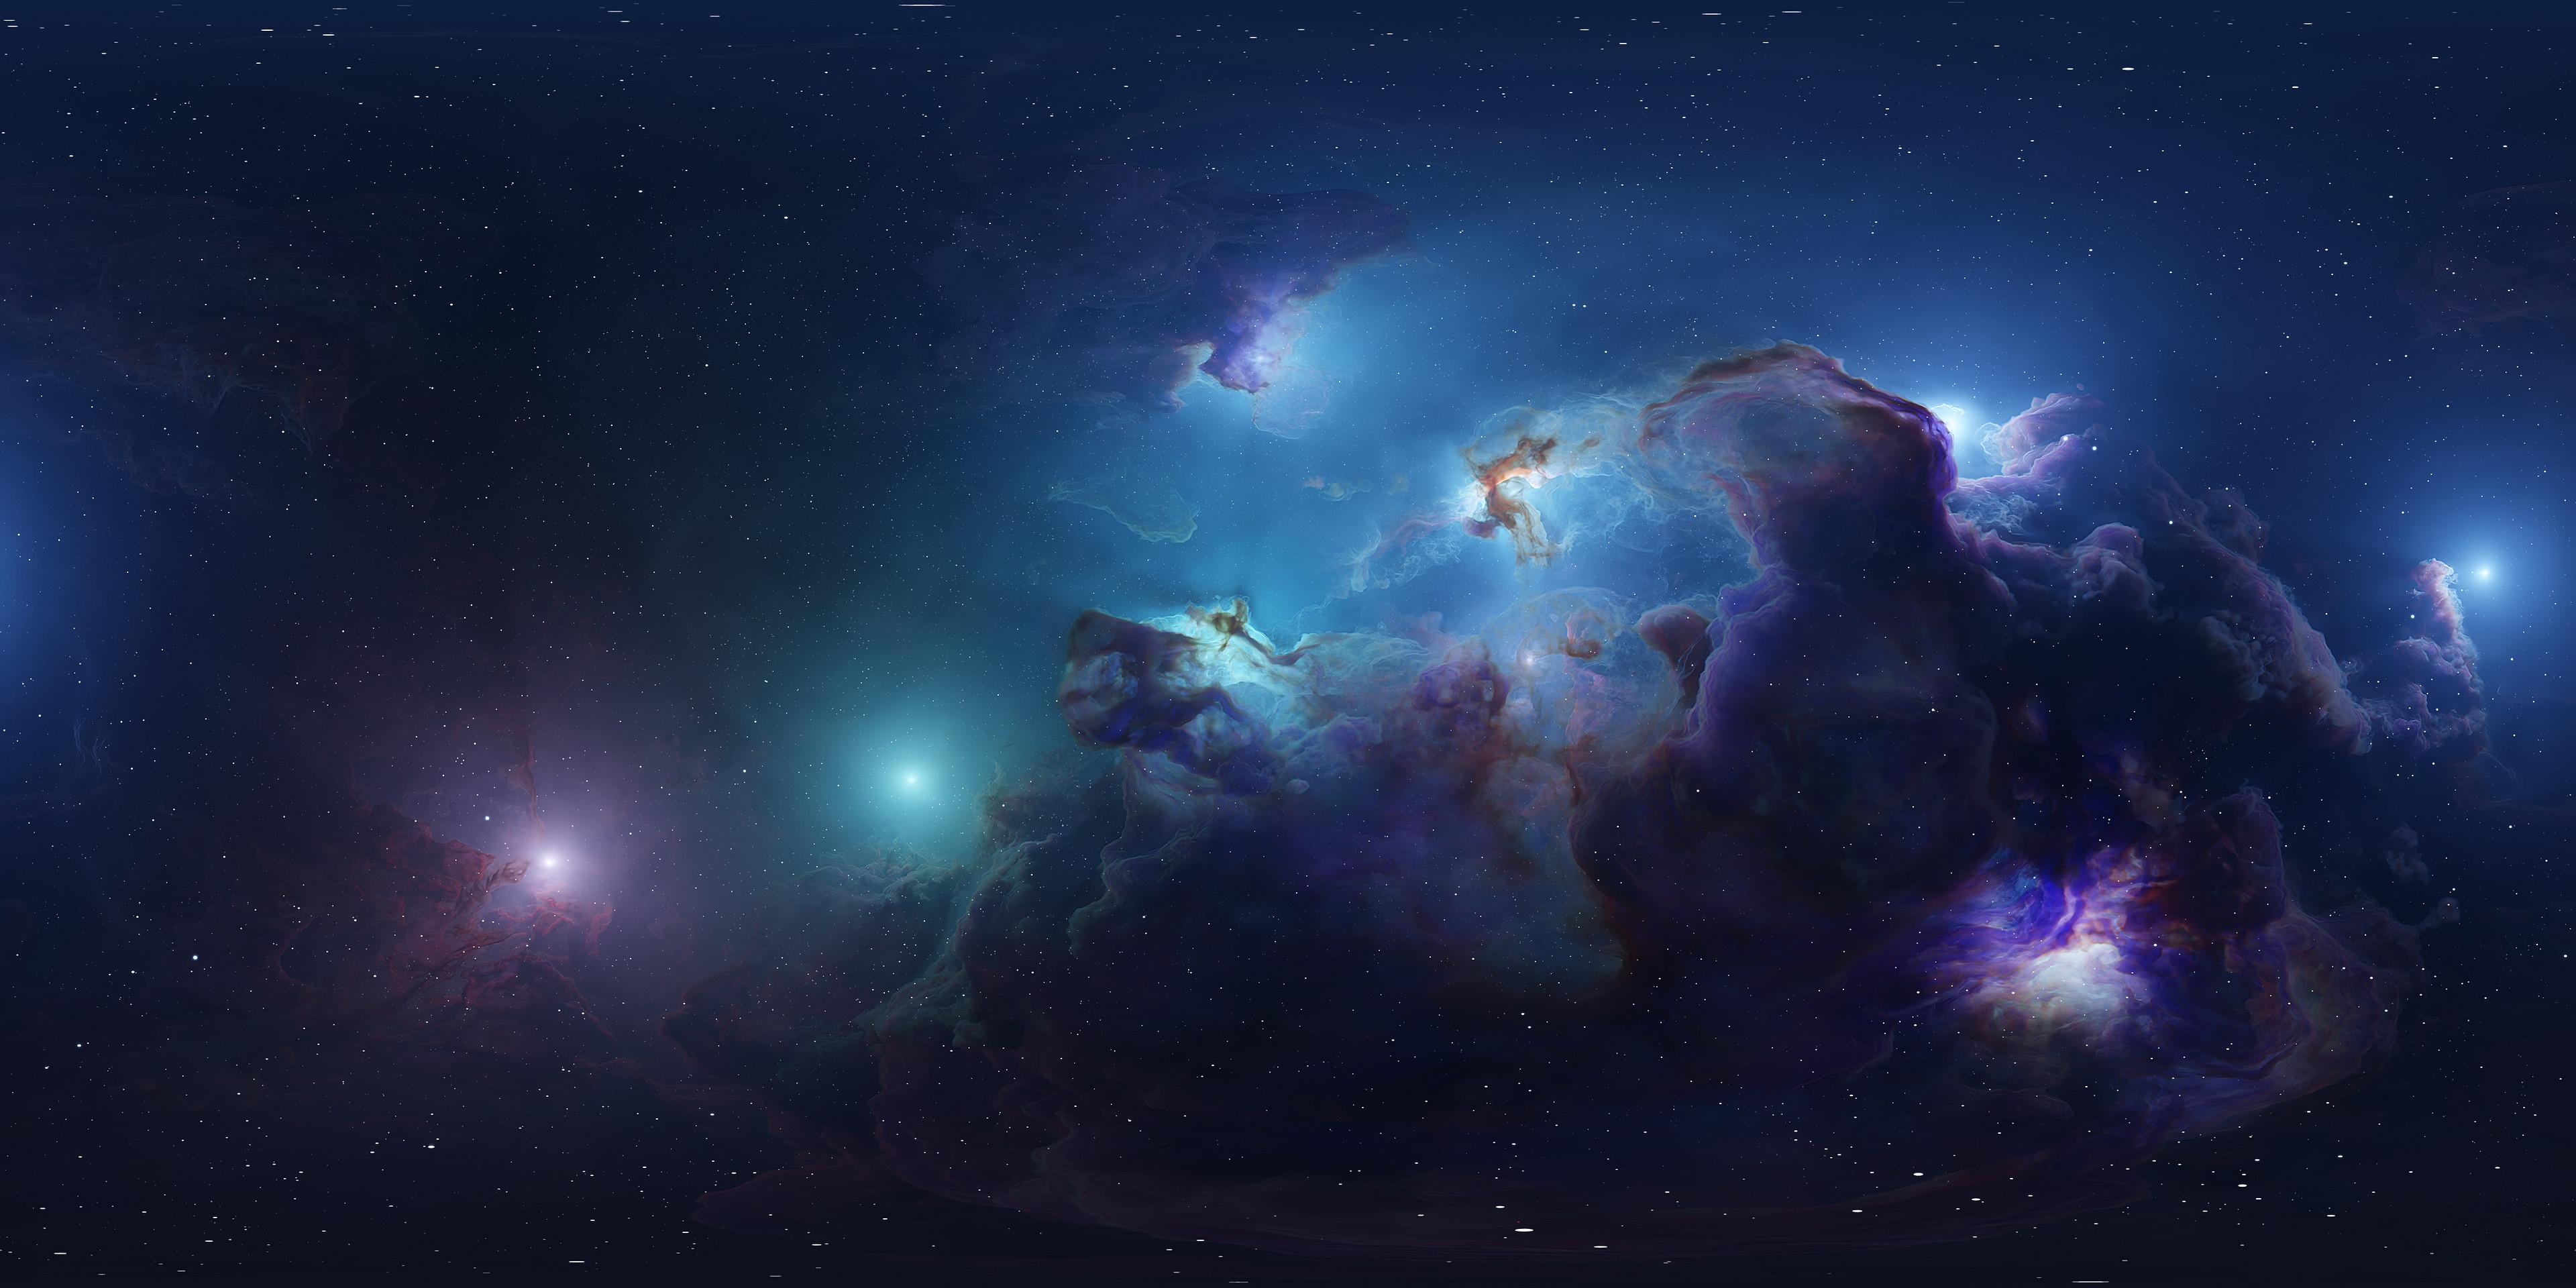 General 3840x1920 ArtStation digital art Tim Barton space nebula space art colorful